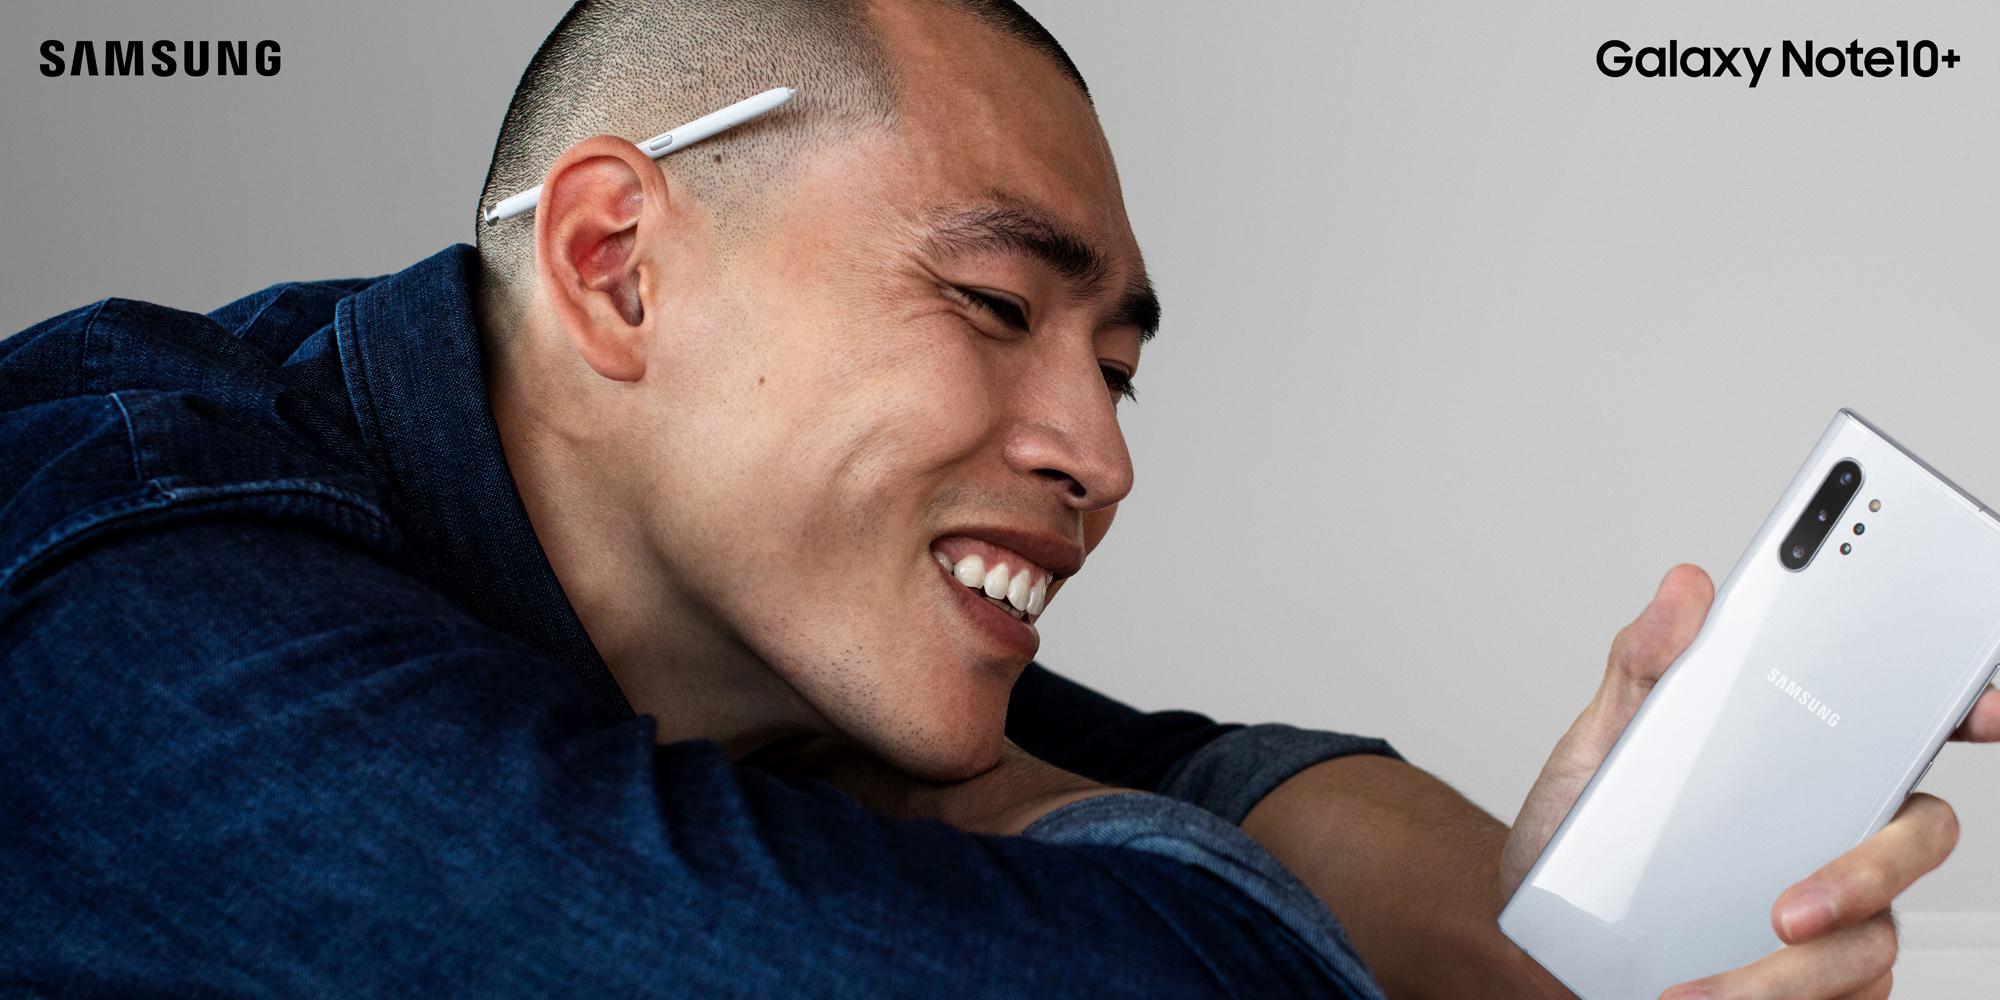 Oppo topples Apple as world's #3 camera phone maker, Samsung still a strong #1   Digital Camera World